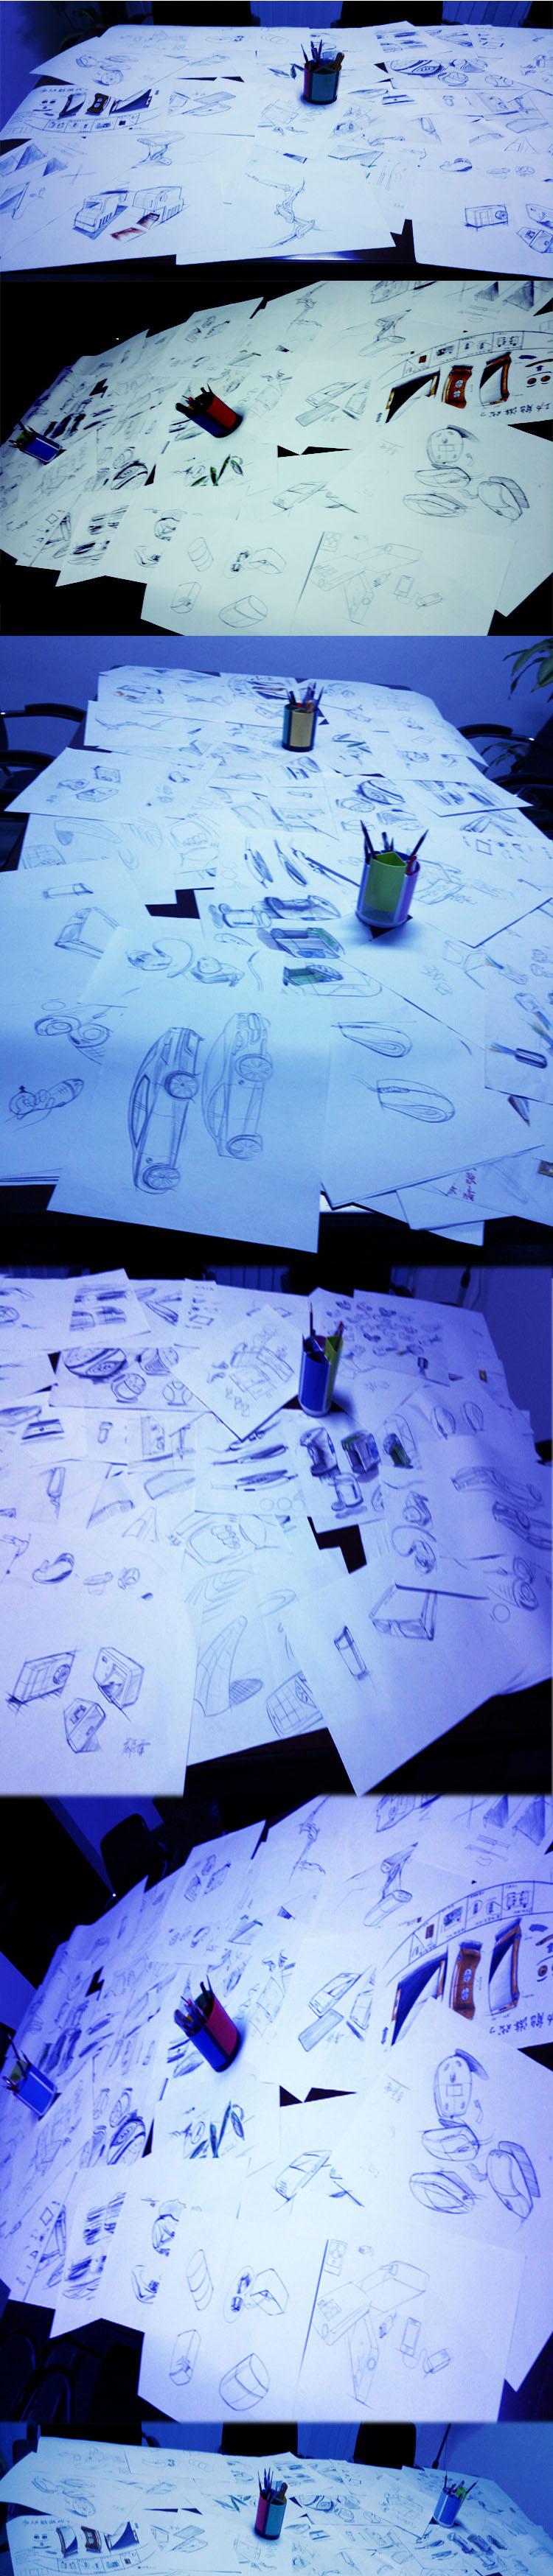 Industrial Design Hand Drawings